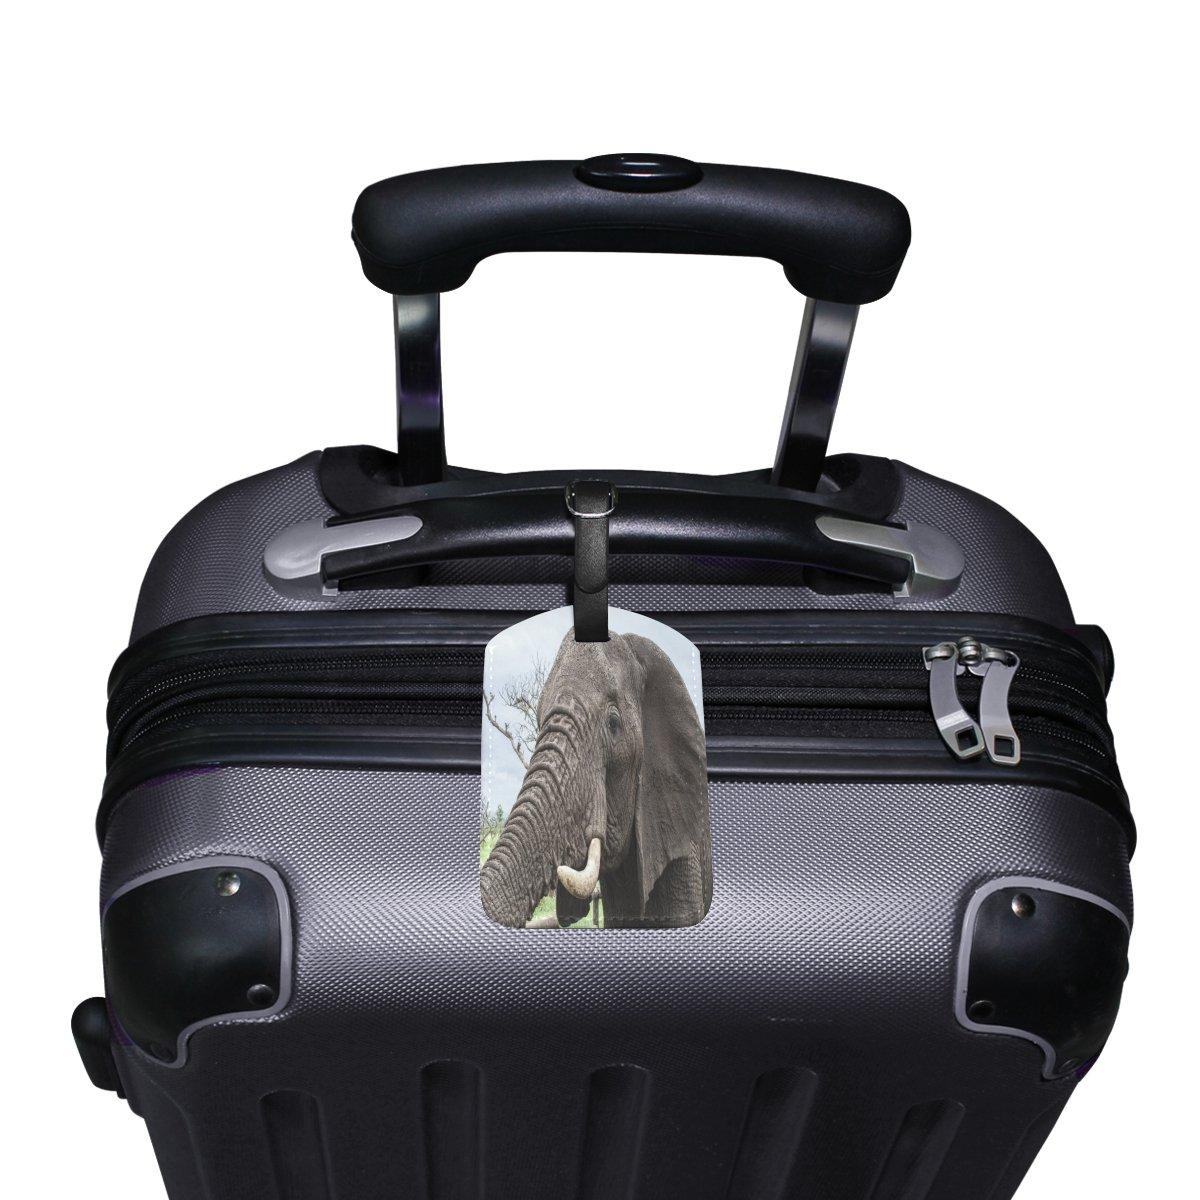 Saobao Travel Luggage Tag Lucky Elephant PU Leather Baggage Suitcase Travel ID Bag Tag 1Pcs